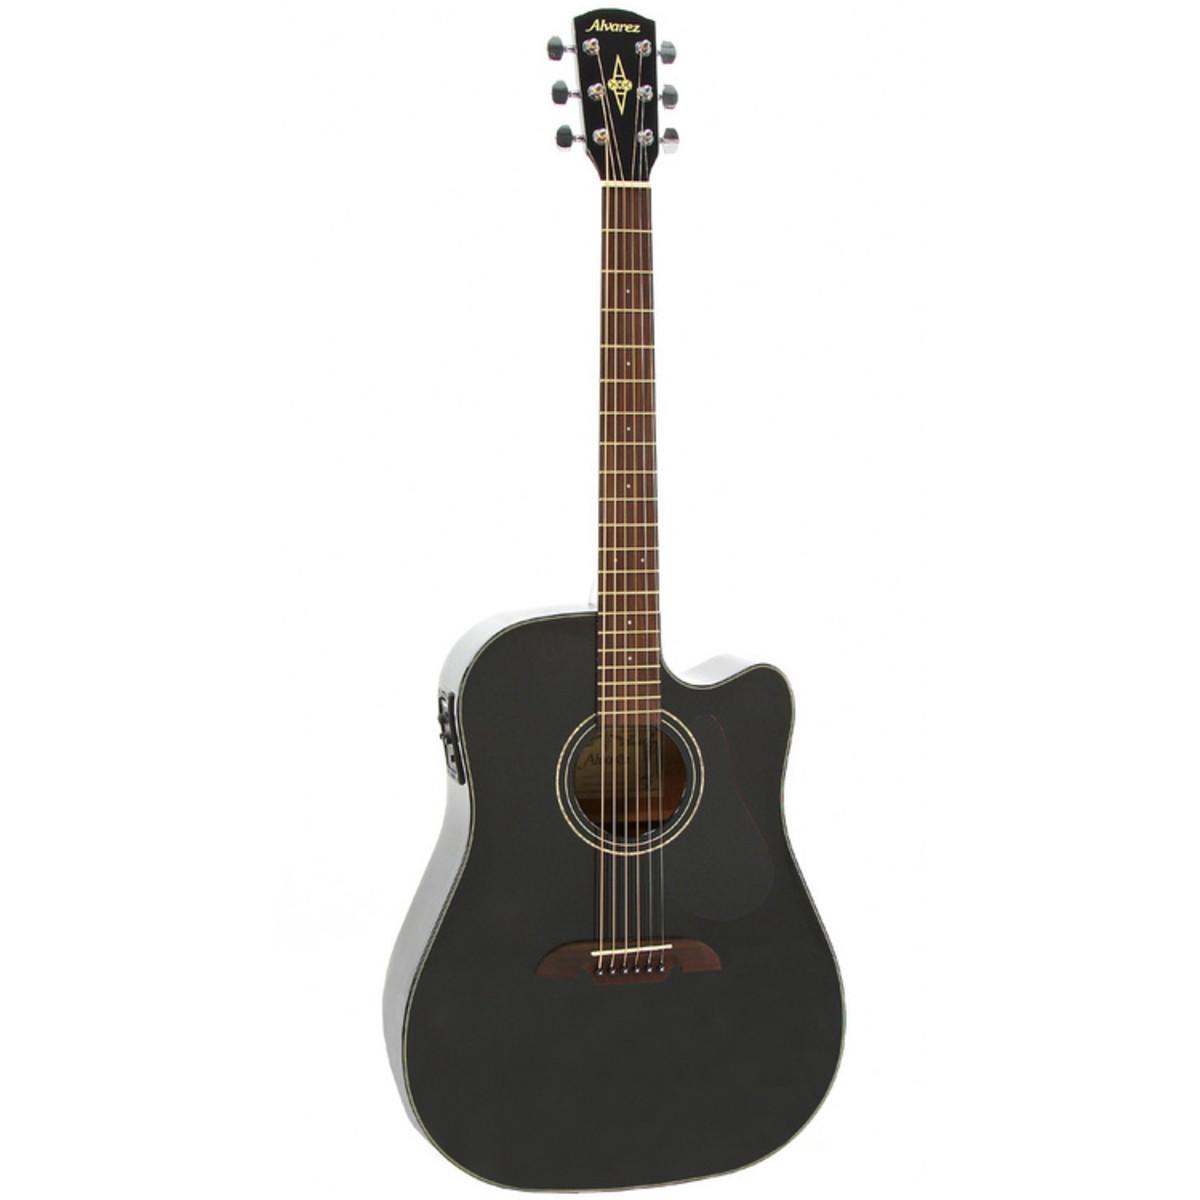 Alvarez RD4102 Electro Acoustic Guitar + Perfect Ten Pack